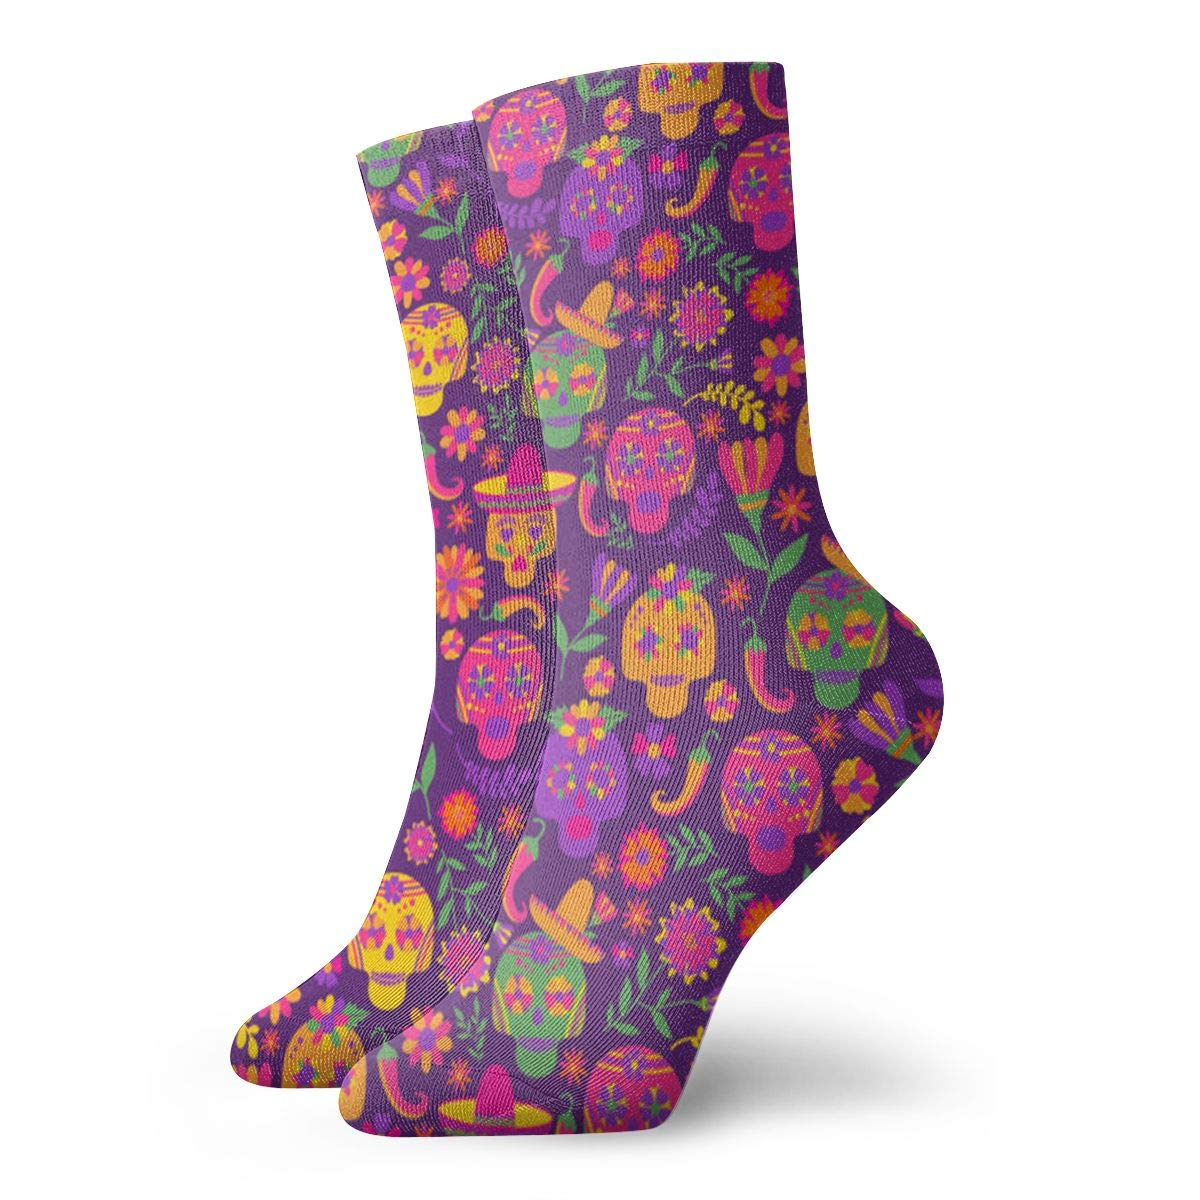 Dia-de-los-muertos Unisex Funny Casual Crew Socks Athletic Socks For Boys Girls Kids Teenagers